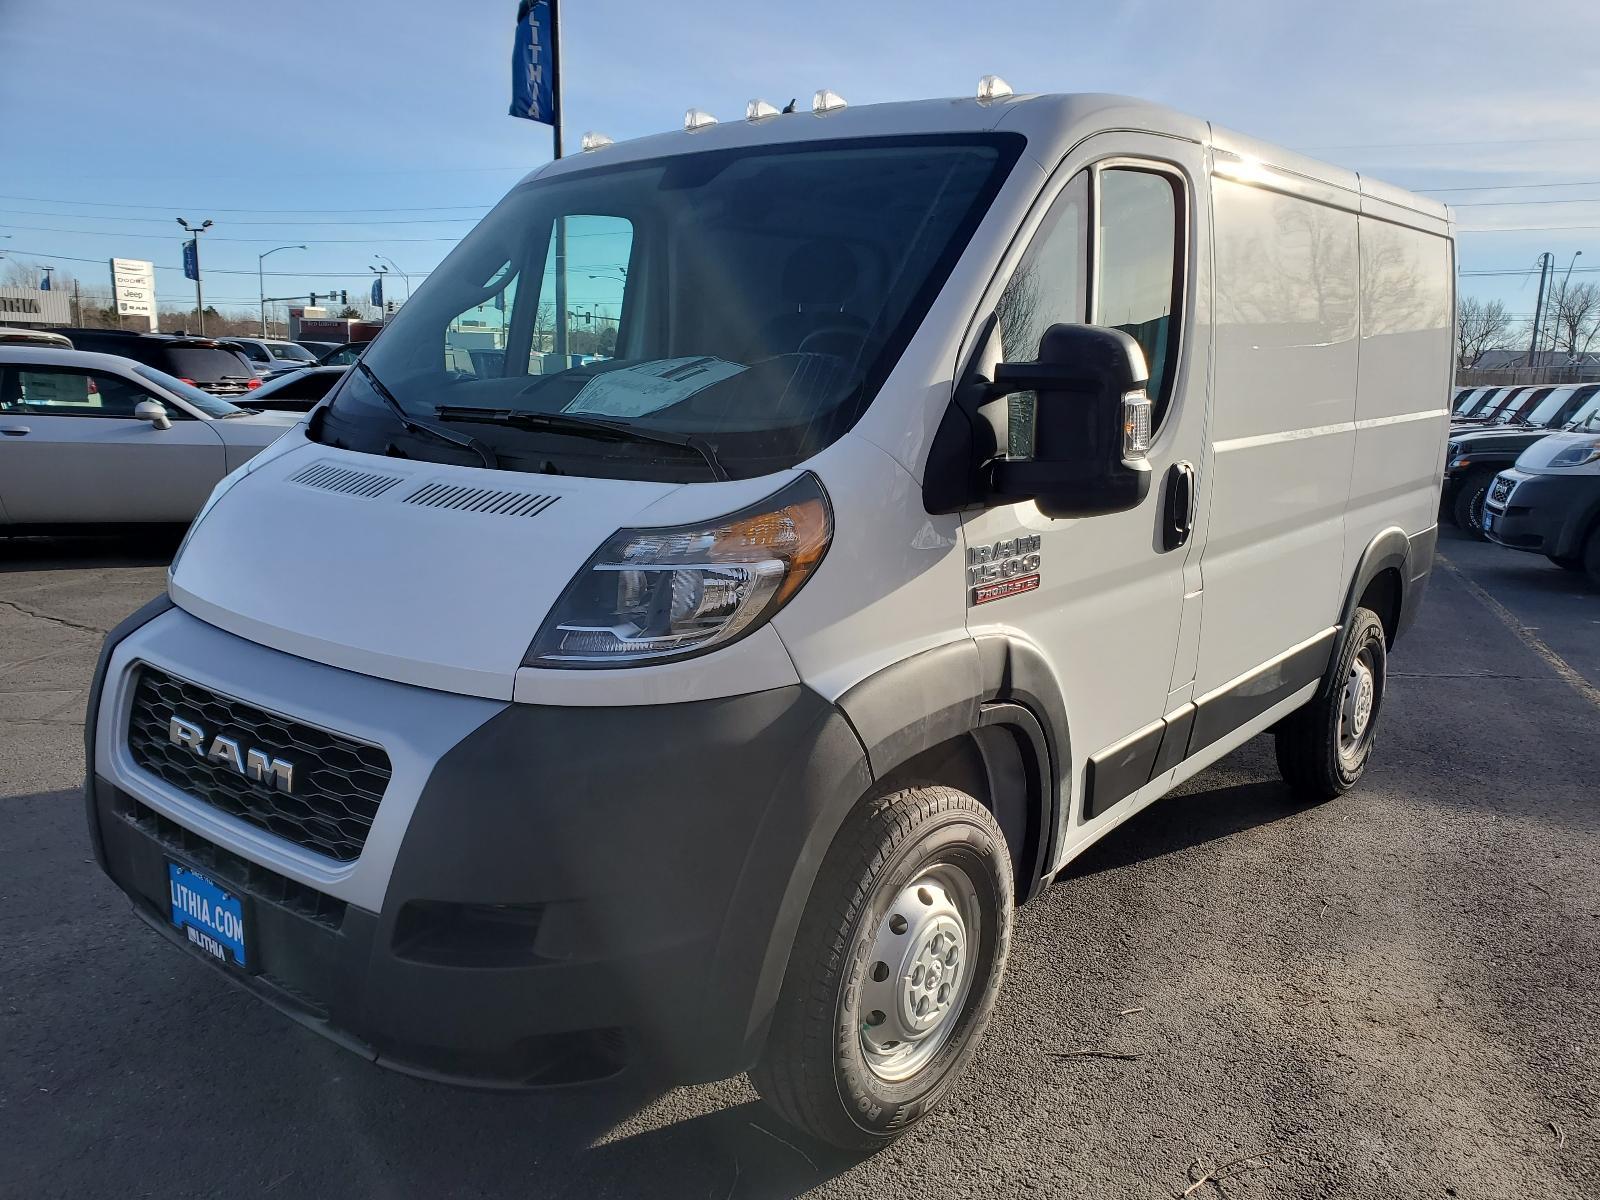 New 2021 Ram Promaster Cargo Van 1500 Cargo Van Low Roof 118 Wb Bright White For Sale Medford Or Lithia Motors Stock Me515940